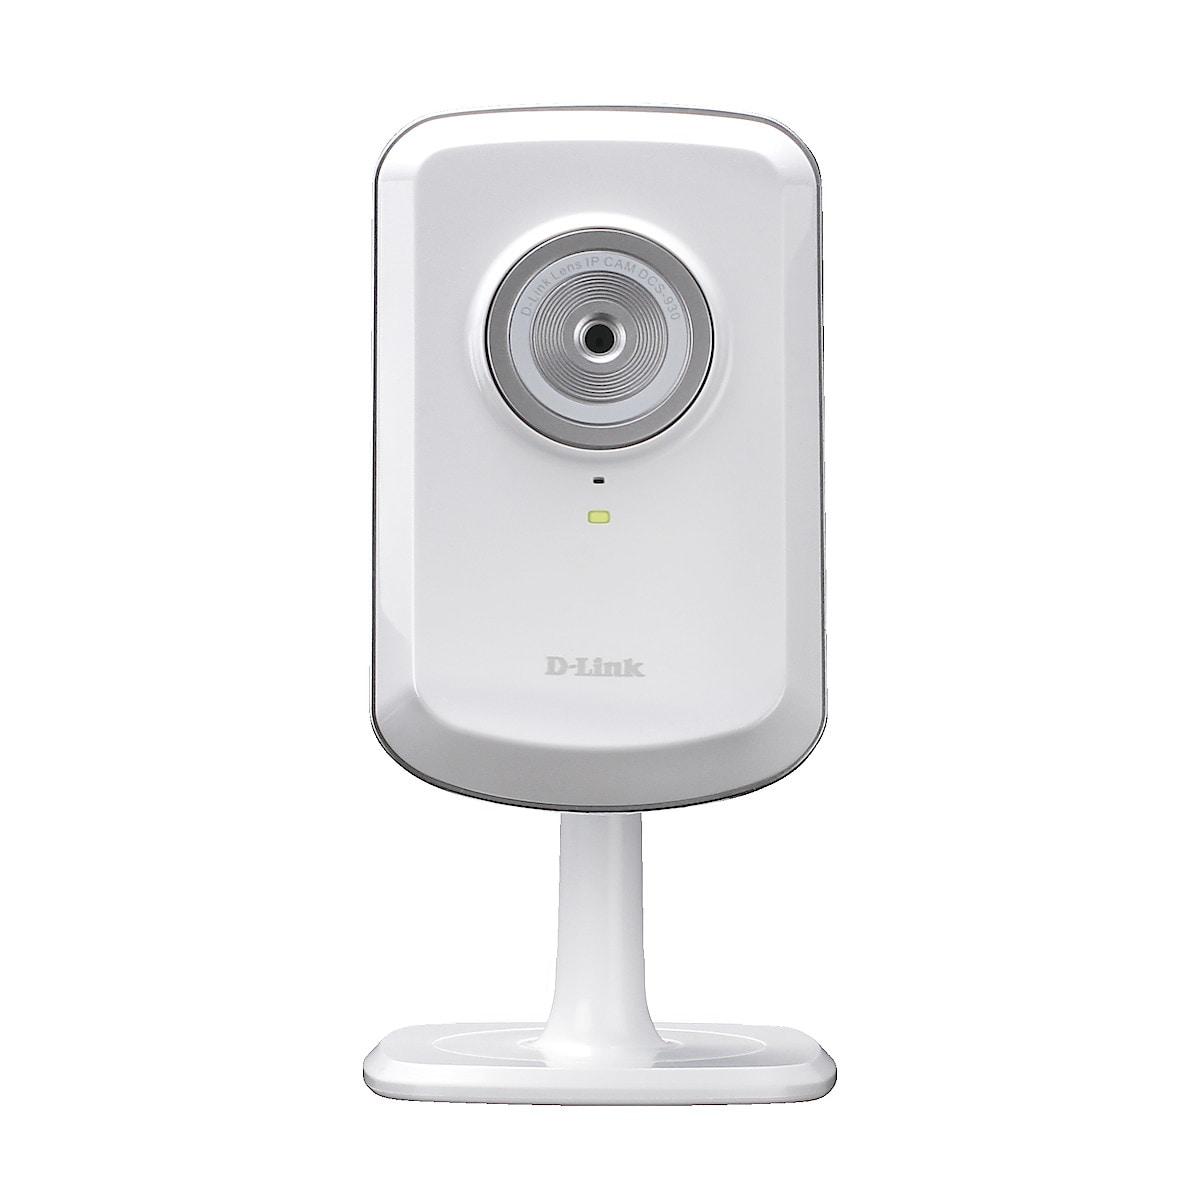 D-Link DCS930L Wireless IP Camera